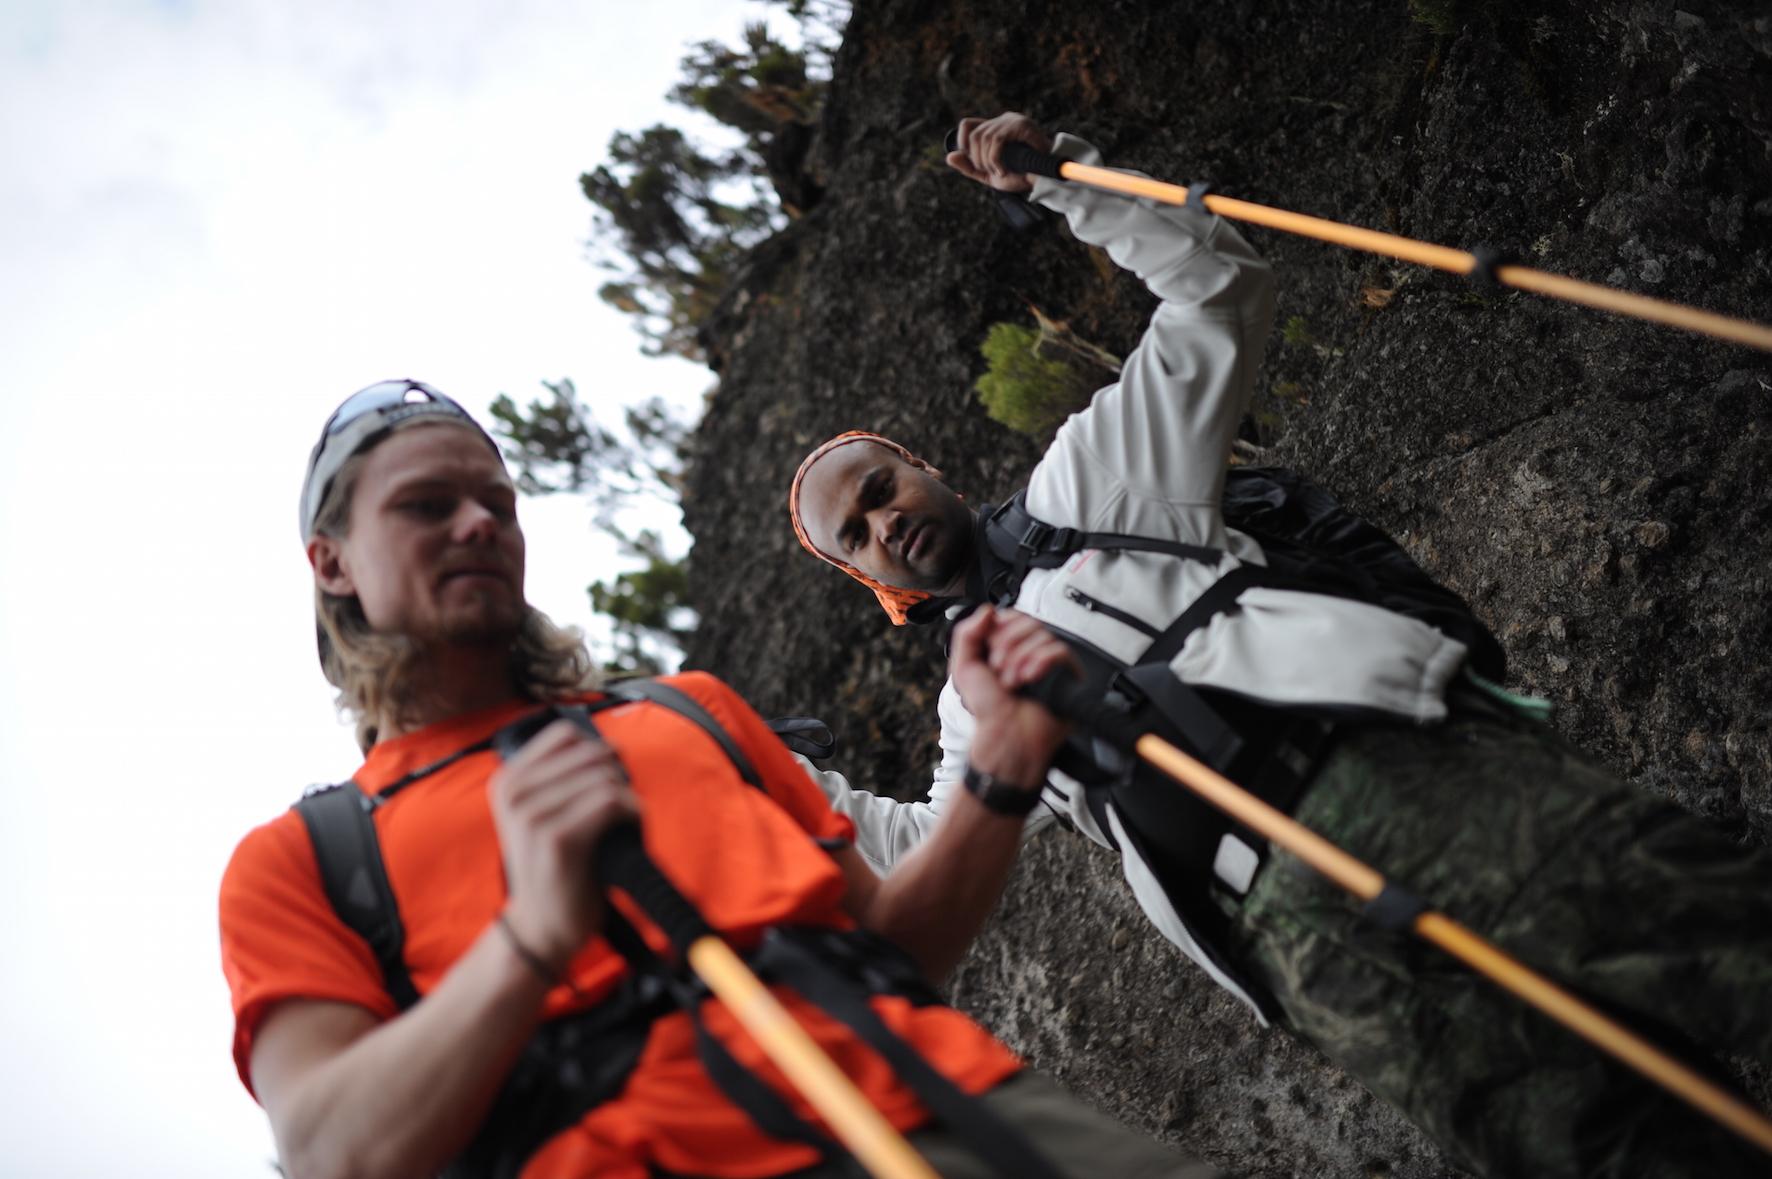 kilimanjaro-vandring-stavar-monne